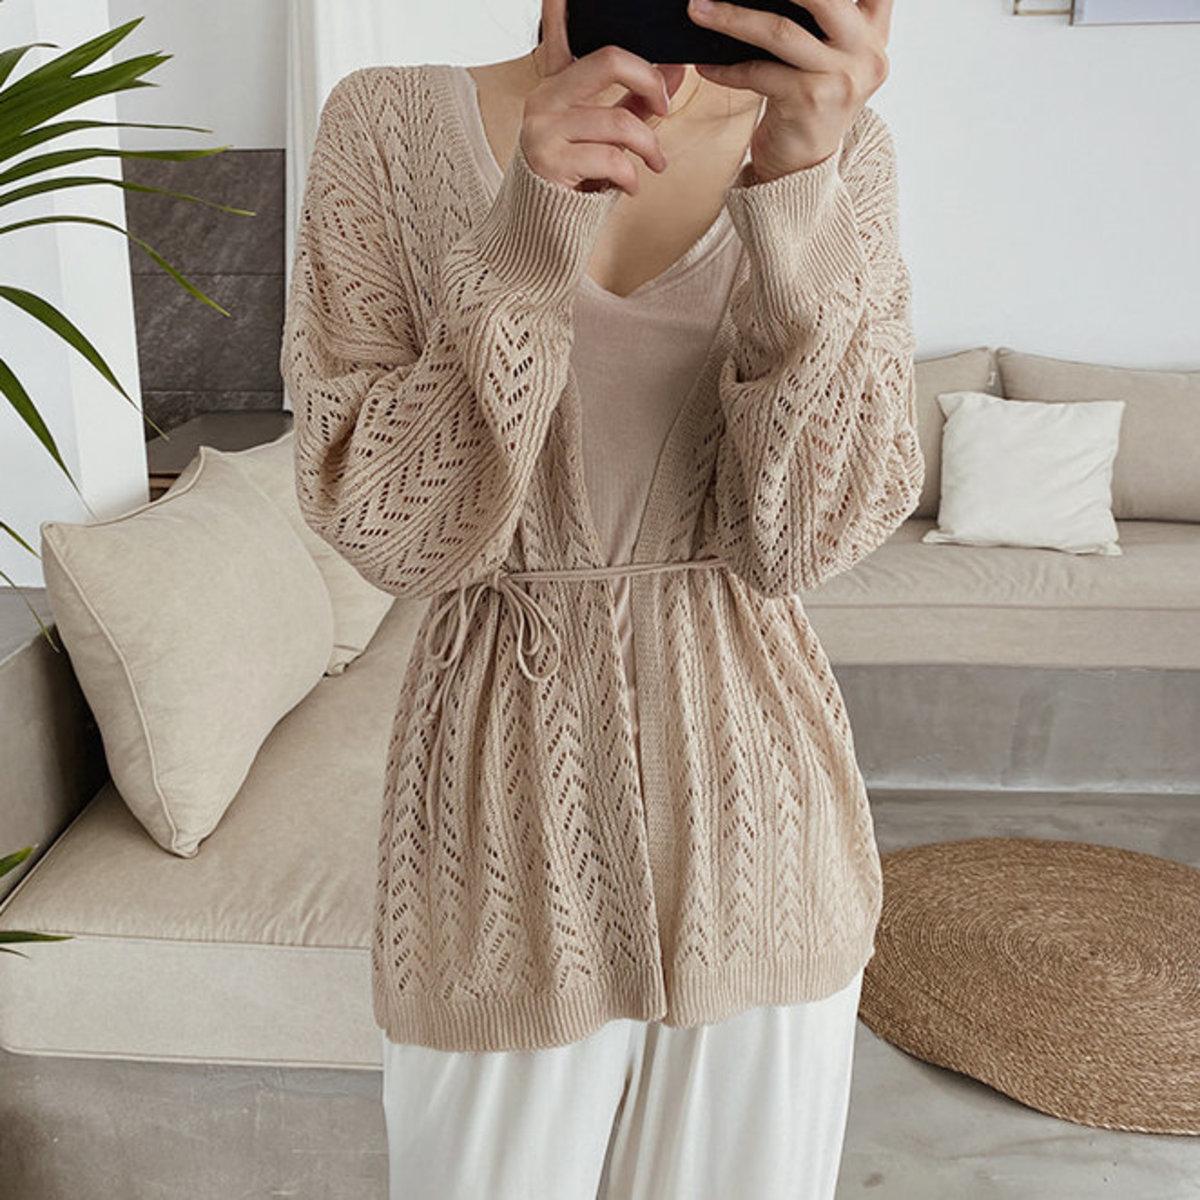 Tie Waist Lace Knit Cardigan